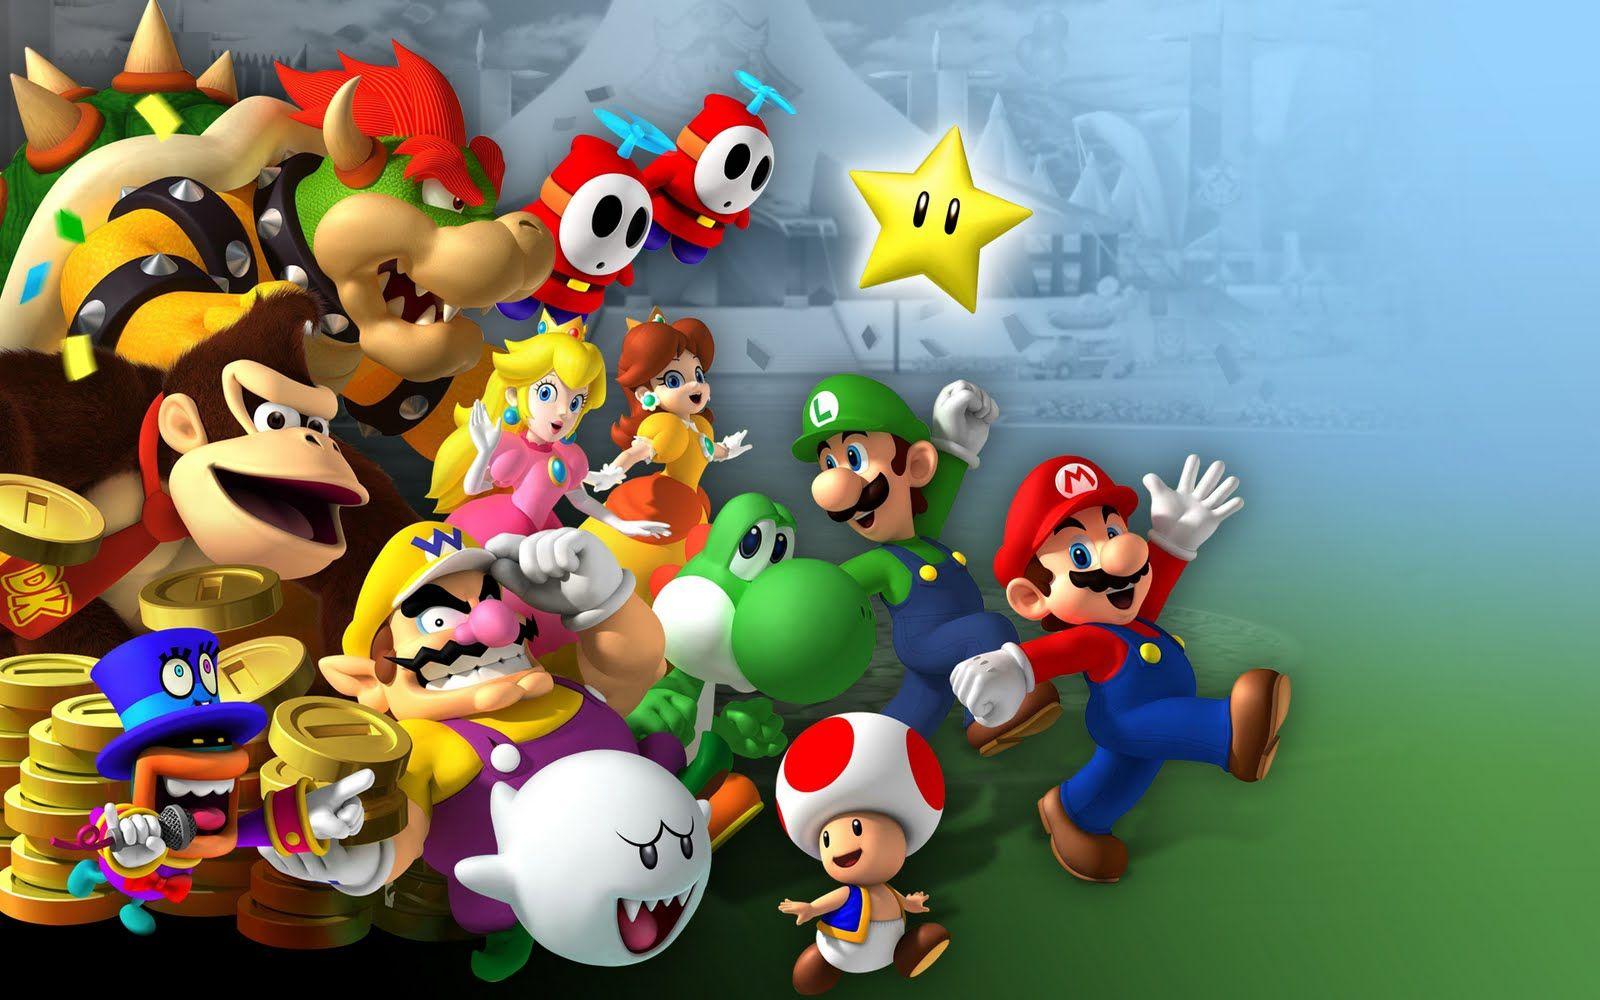 Super Mario Game Wallpapers Hd Backgrounds Mario And Luigi Mario Party Mario Bros